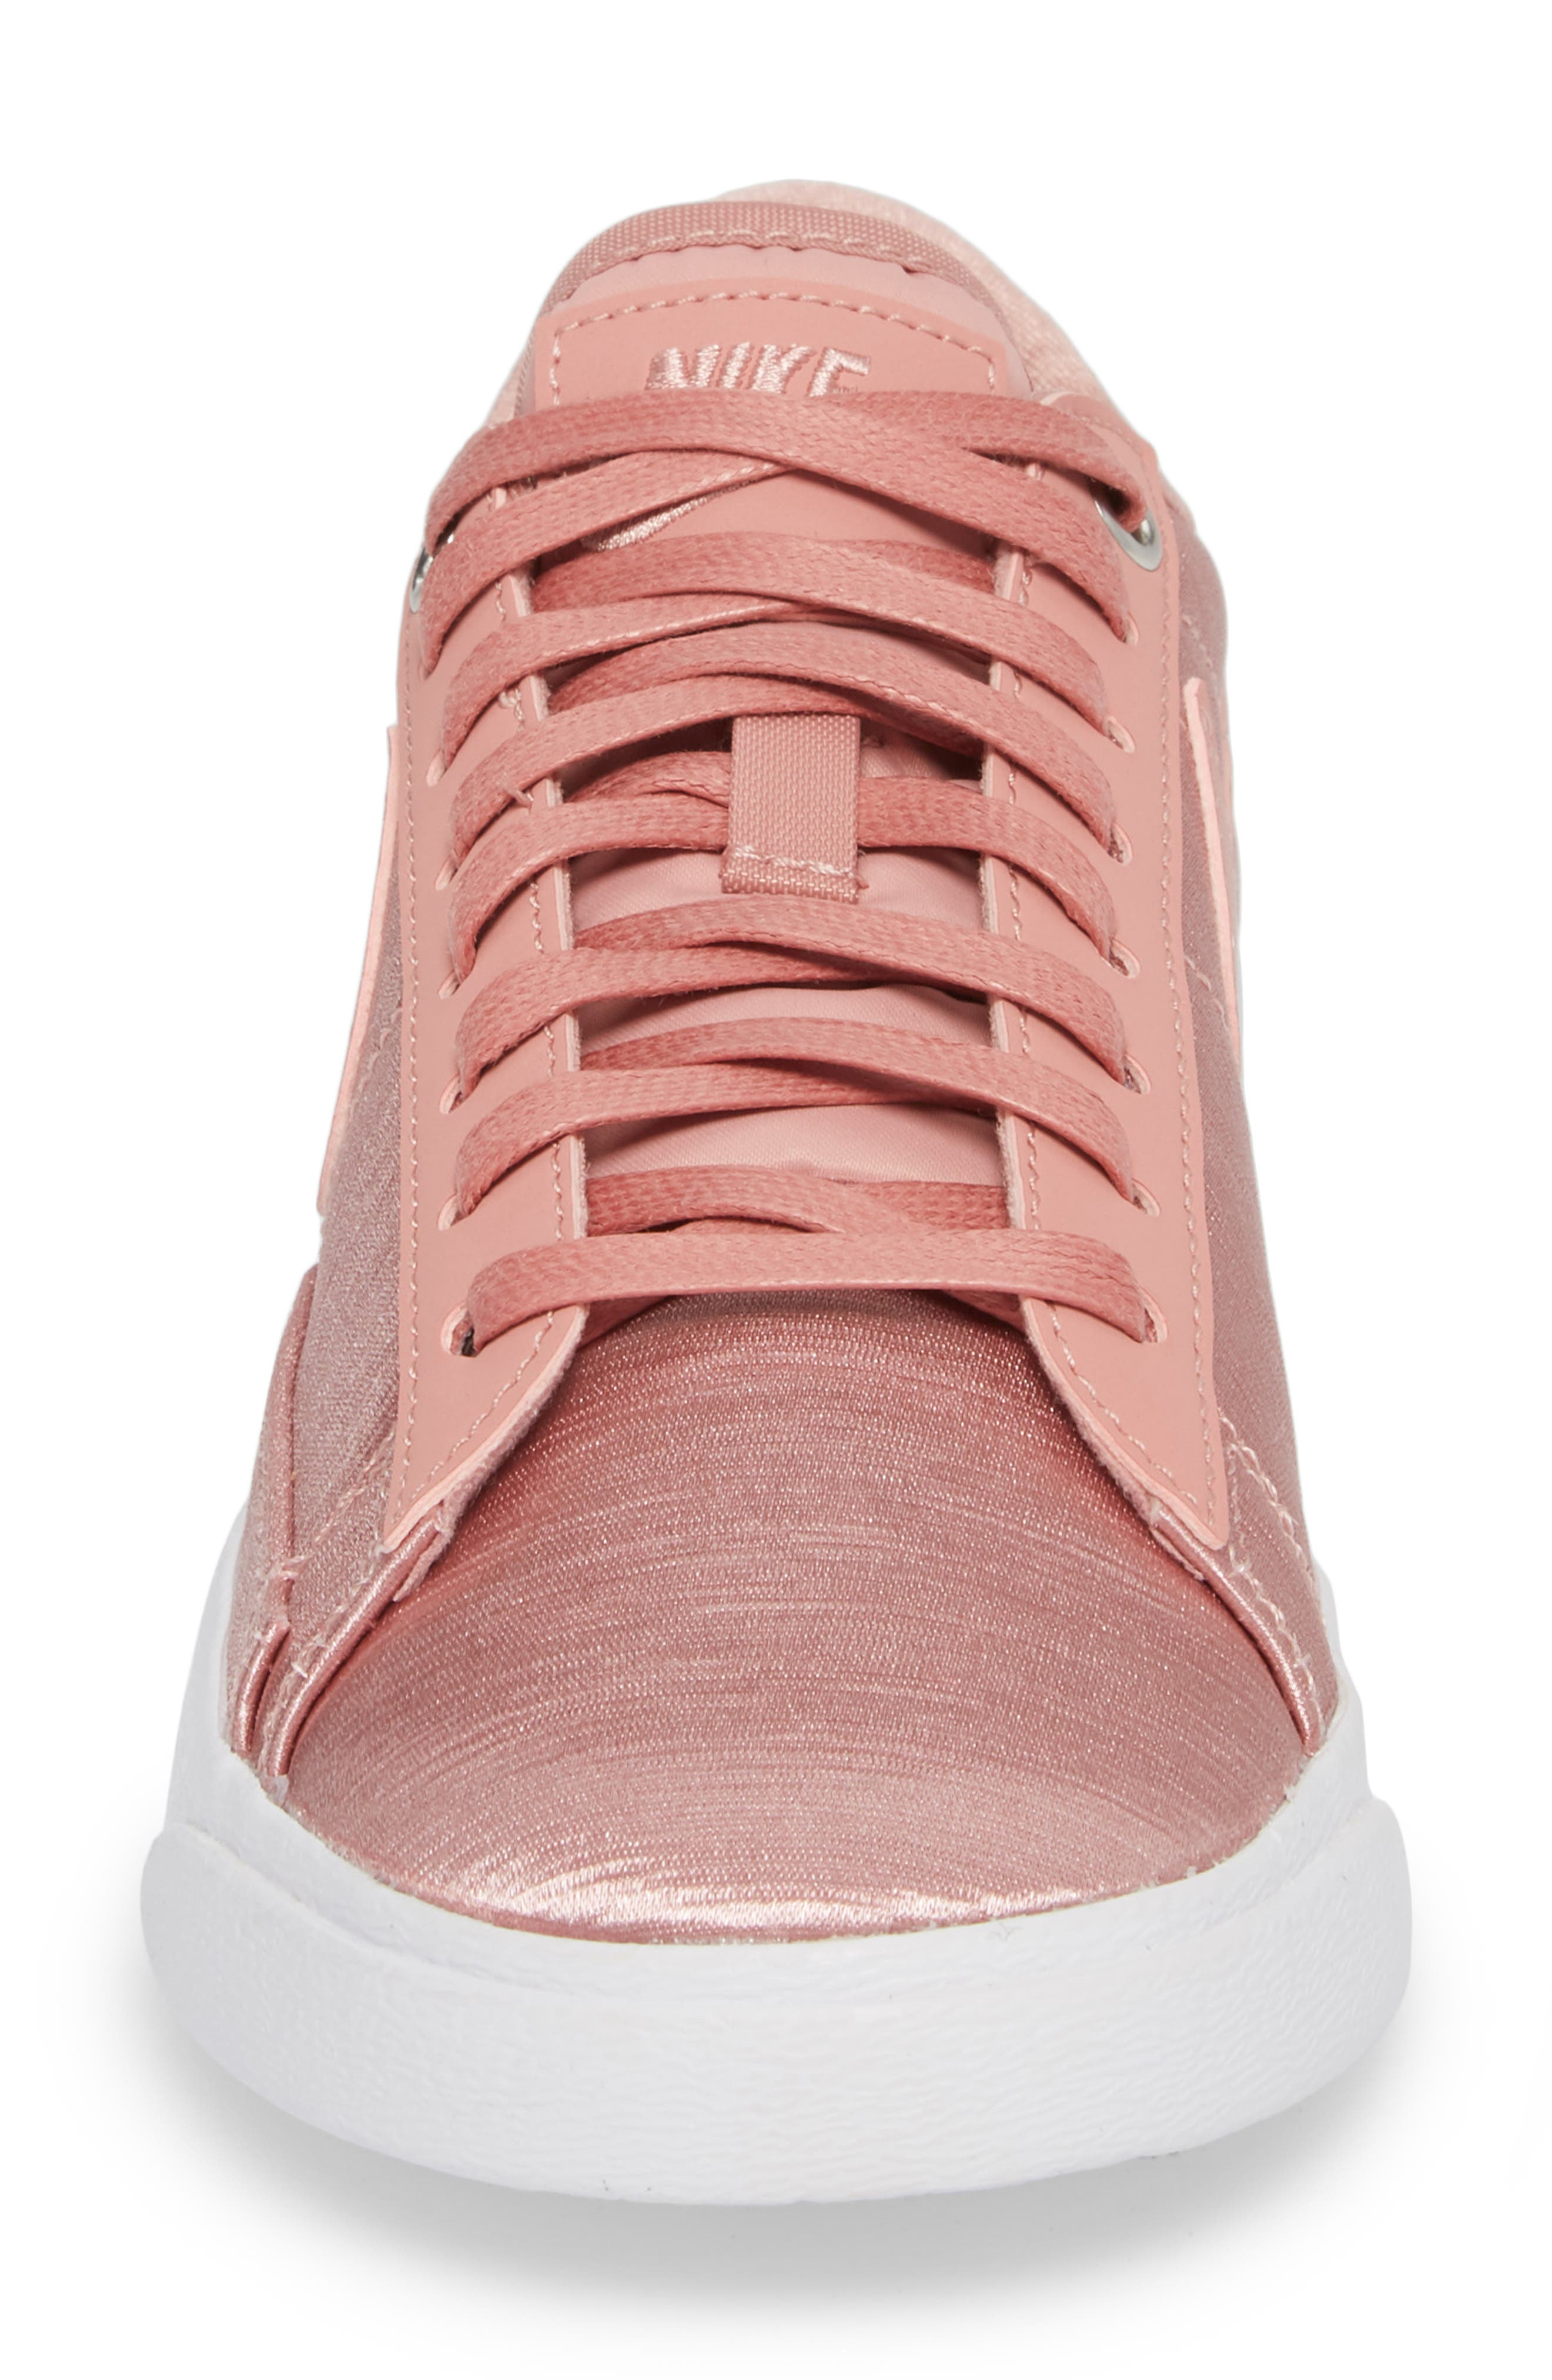 Blazer Low SE Sneaker,                             Alternate thumbnail 4, color,                             RUST PINK/ RUST PINK